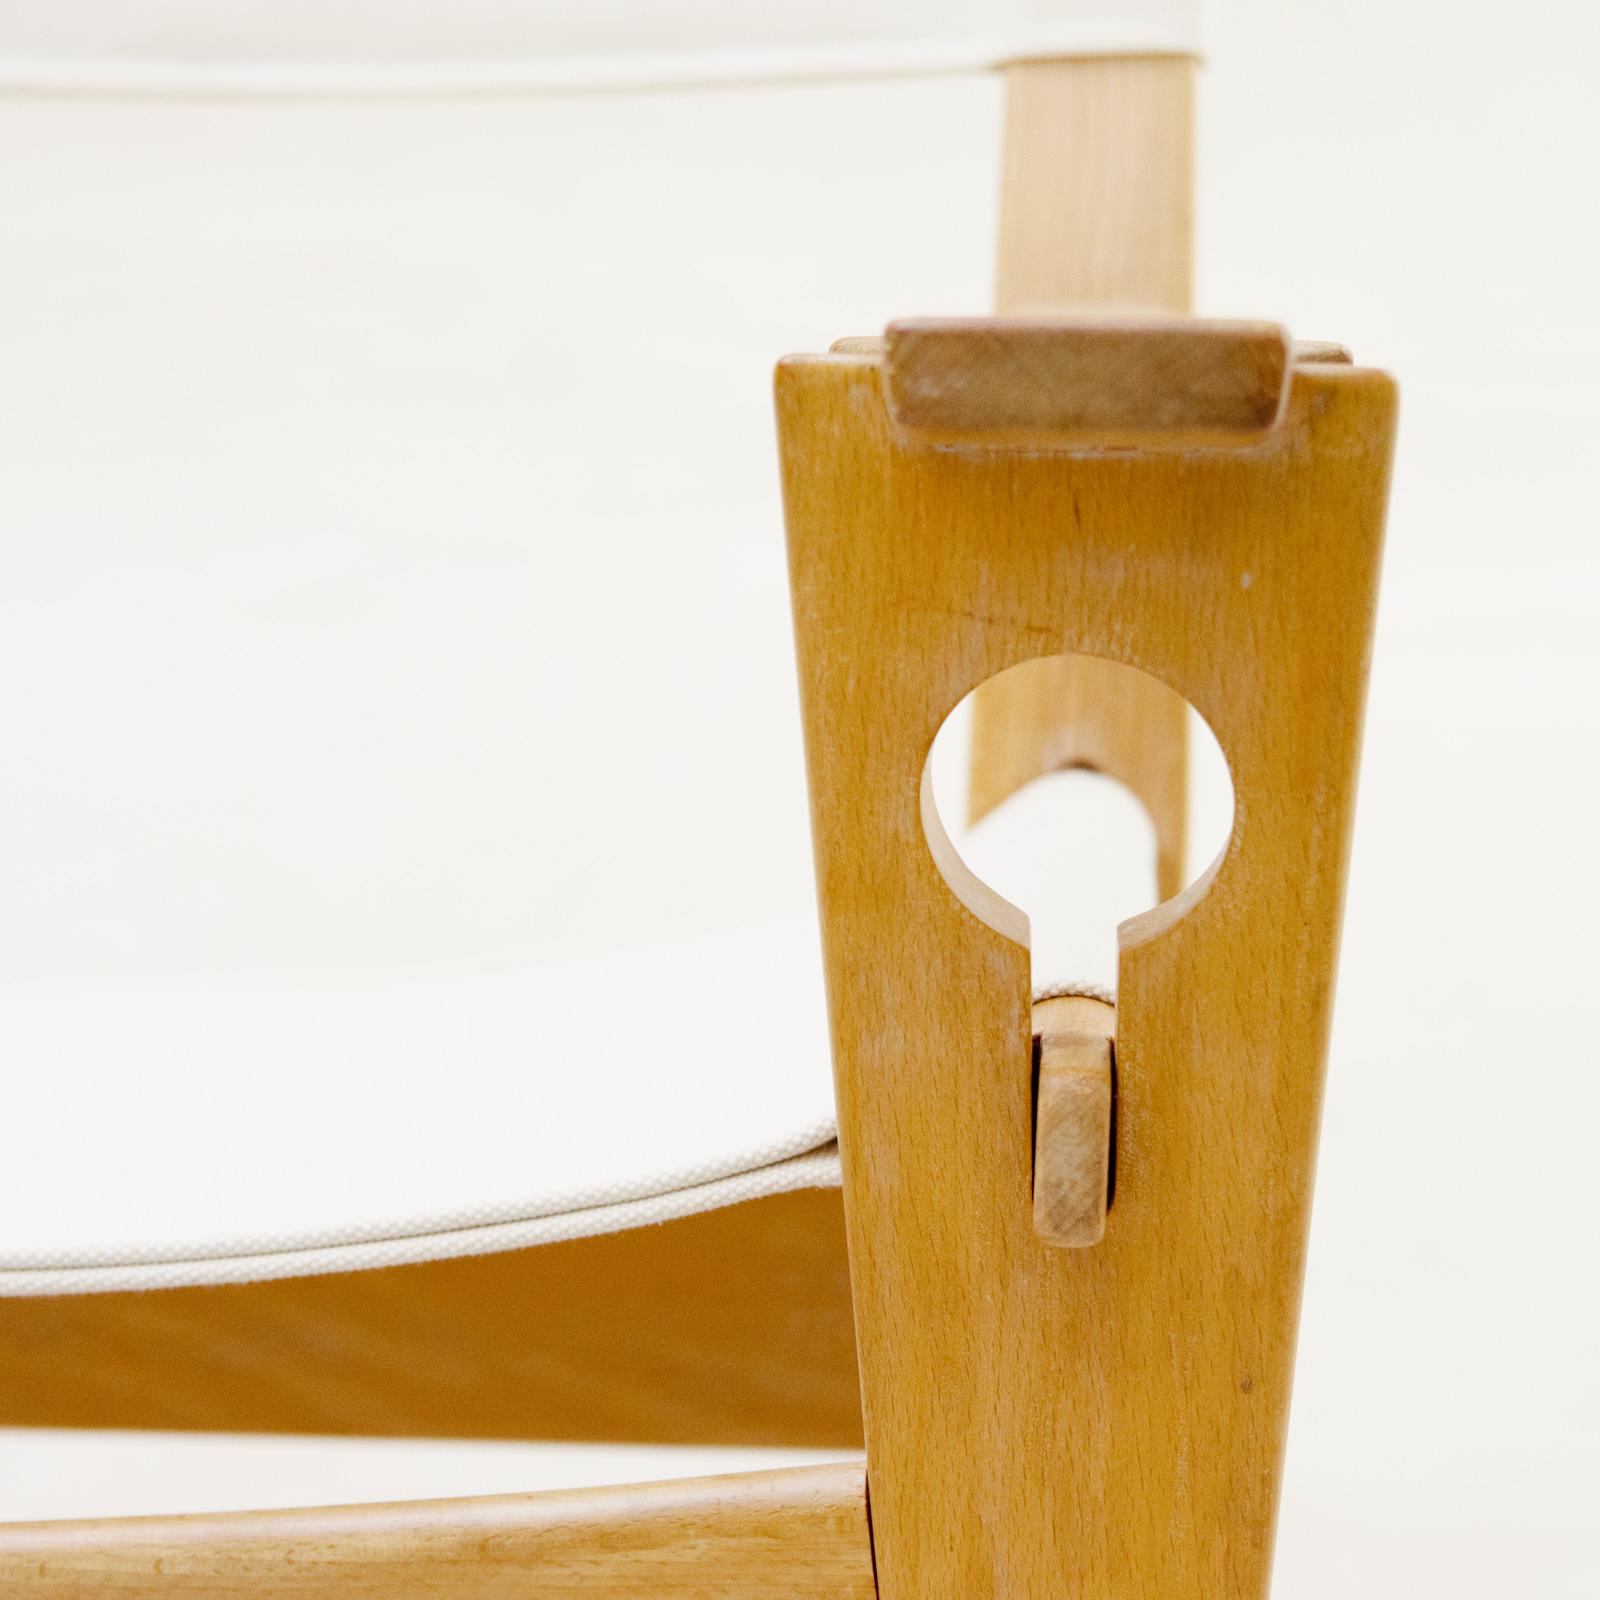 GE673 Keyhole Rocking Chair by Hans J Wegner